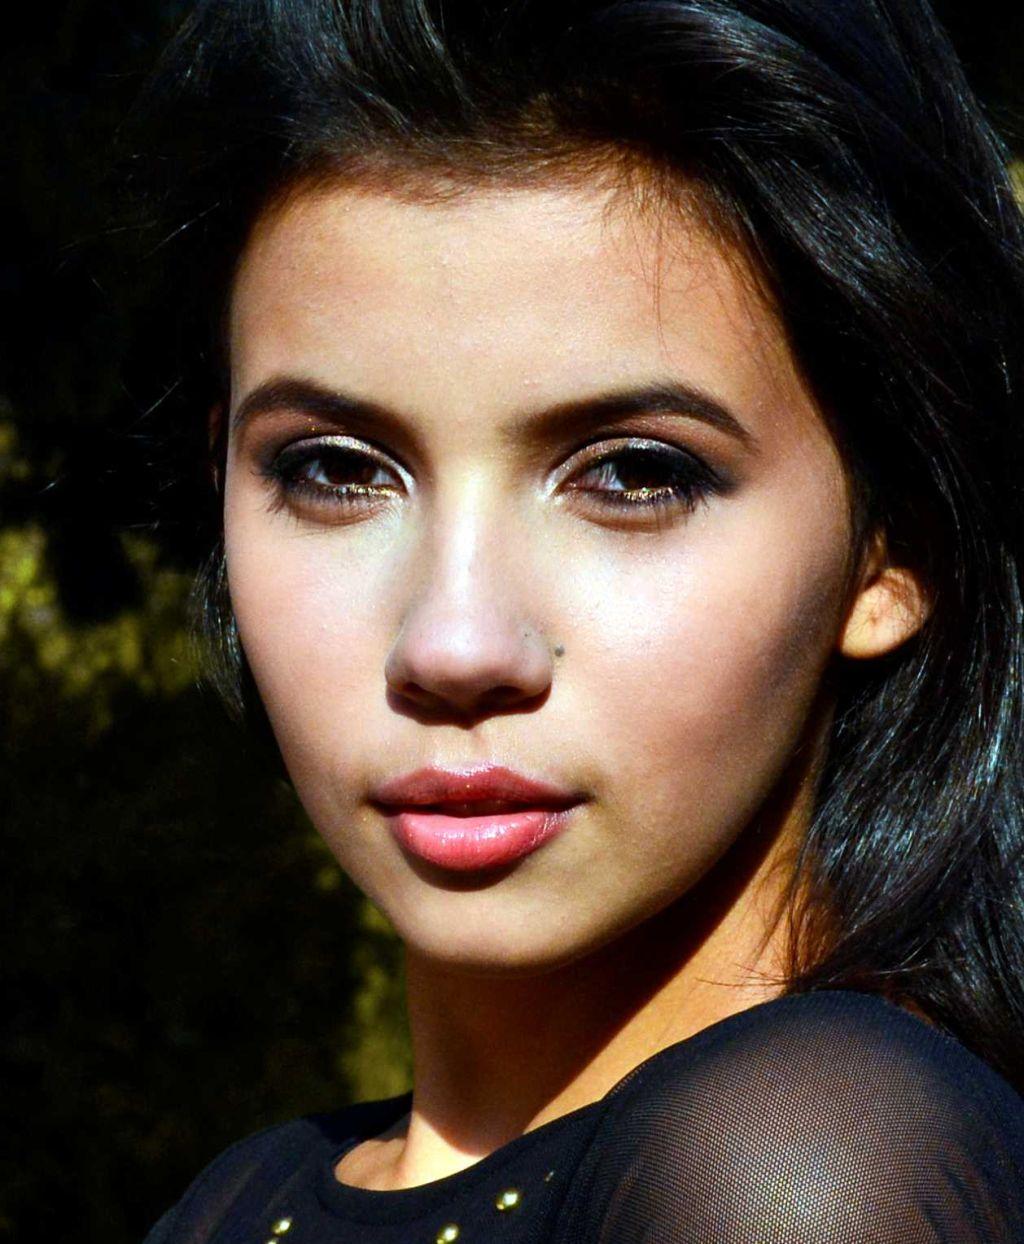 Machiaj realizat de make-up artist Ruxandra Mesteru 2